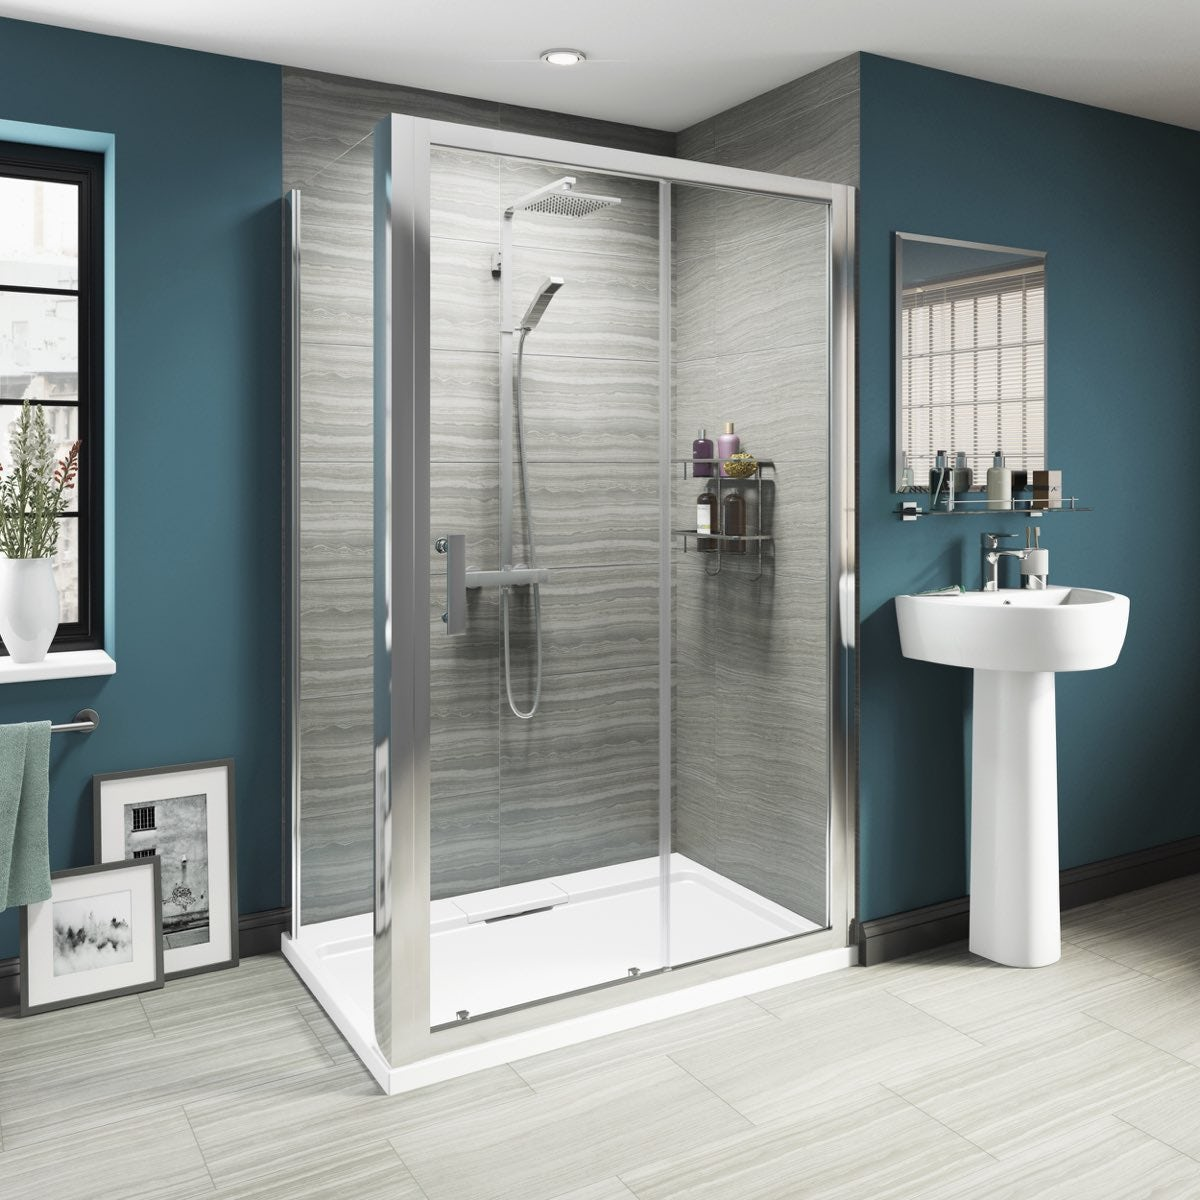 Mode luxury 8mm sliding door shower enclosure - Luxury shower cubicles ...